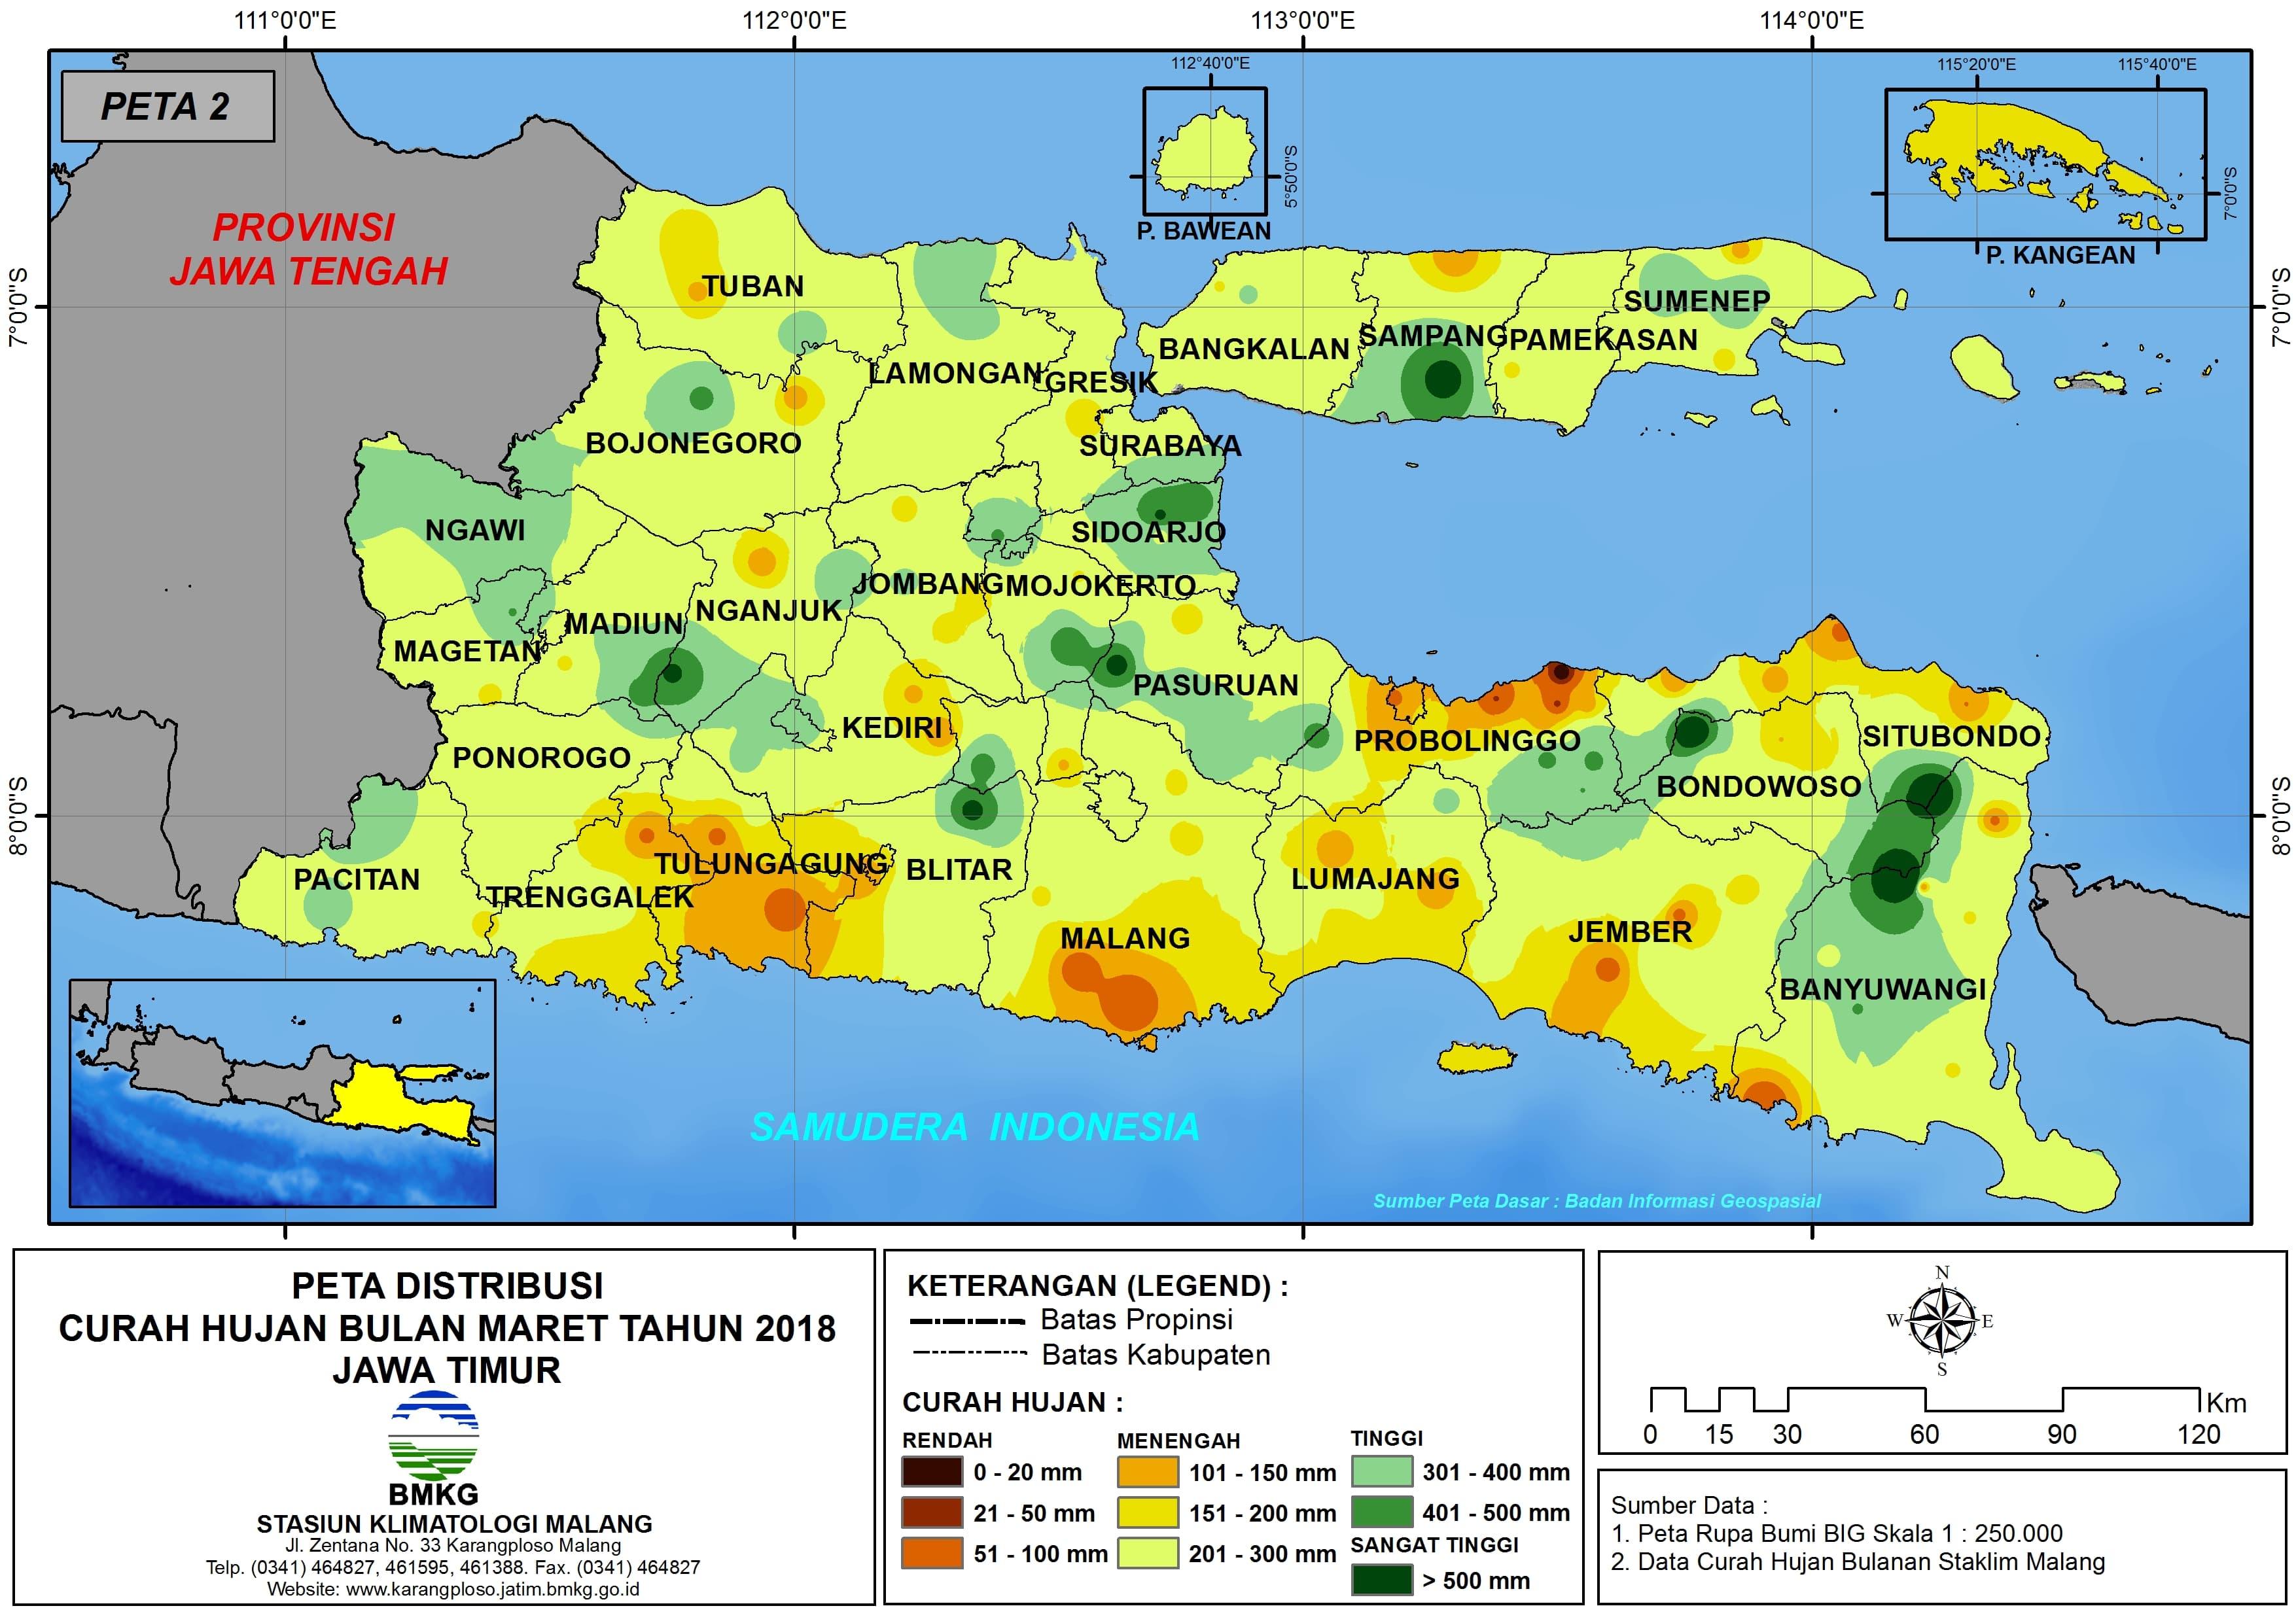 Analisis Distribusi Curah Hujan Bulan Maret Tahun 2018 di Propinsi Jawa Timur